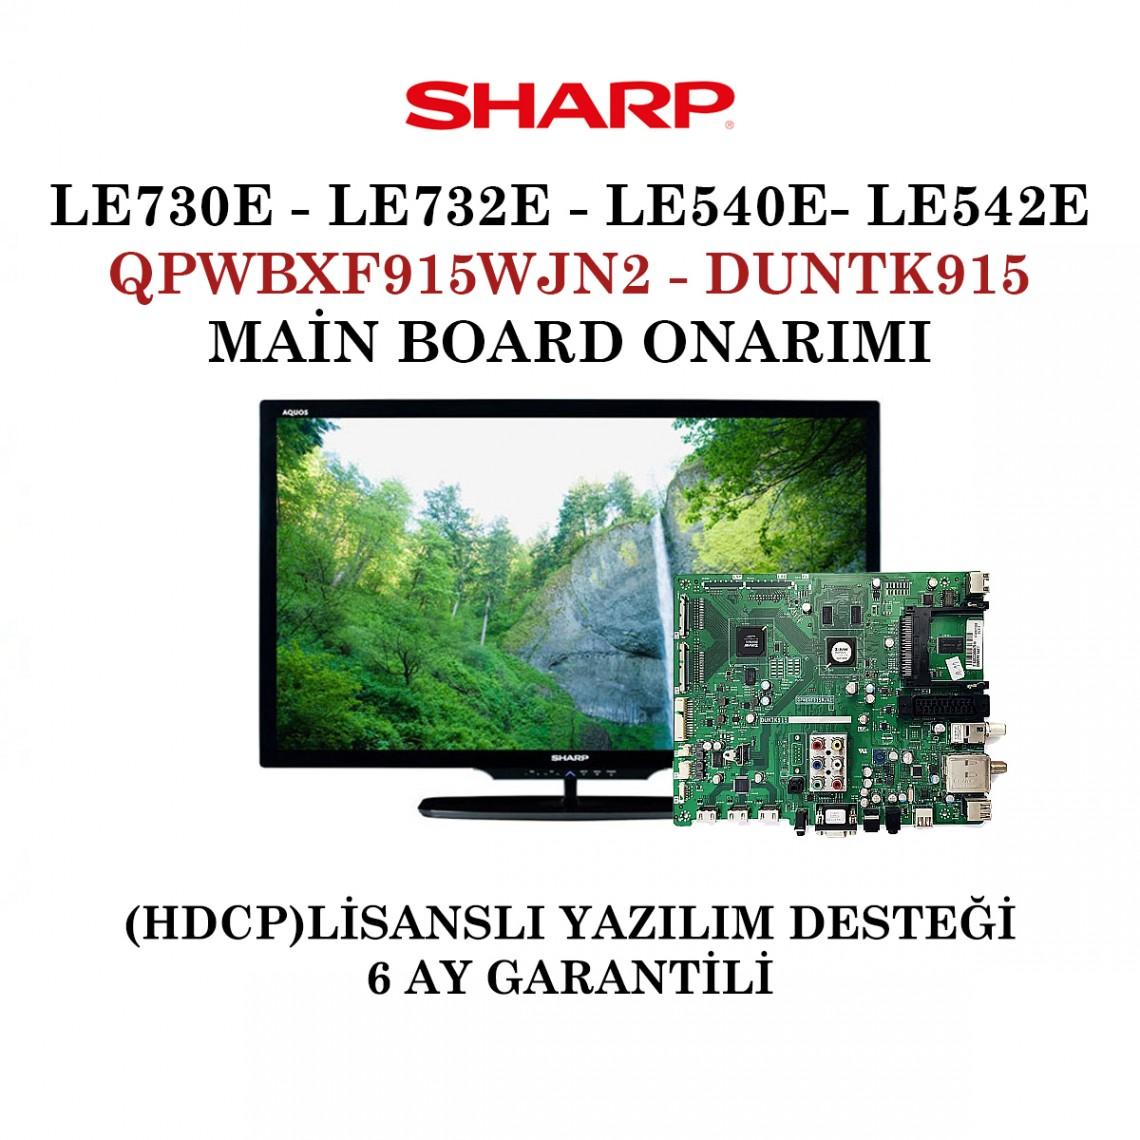 SHARP , QPWBXF915WJN2 , DUNTK915, LC-40LE730E, LC-40LE730EVNET, LC-40LE732E, LC-40LE732ENET,  LC-40LE540E, LC-40LE542E, LC-46LE730E, LC-46LE730EVNET, LC-46LE732E, LC-46LE732ENET, LC-46LE540E, LC46LE542E, Main Board Onarımı